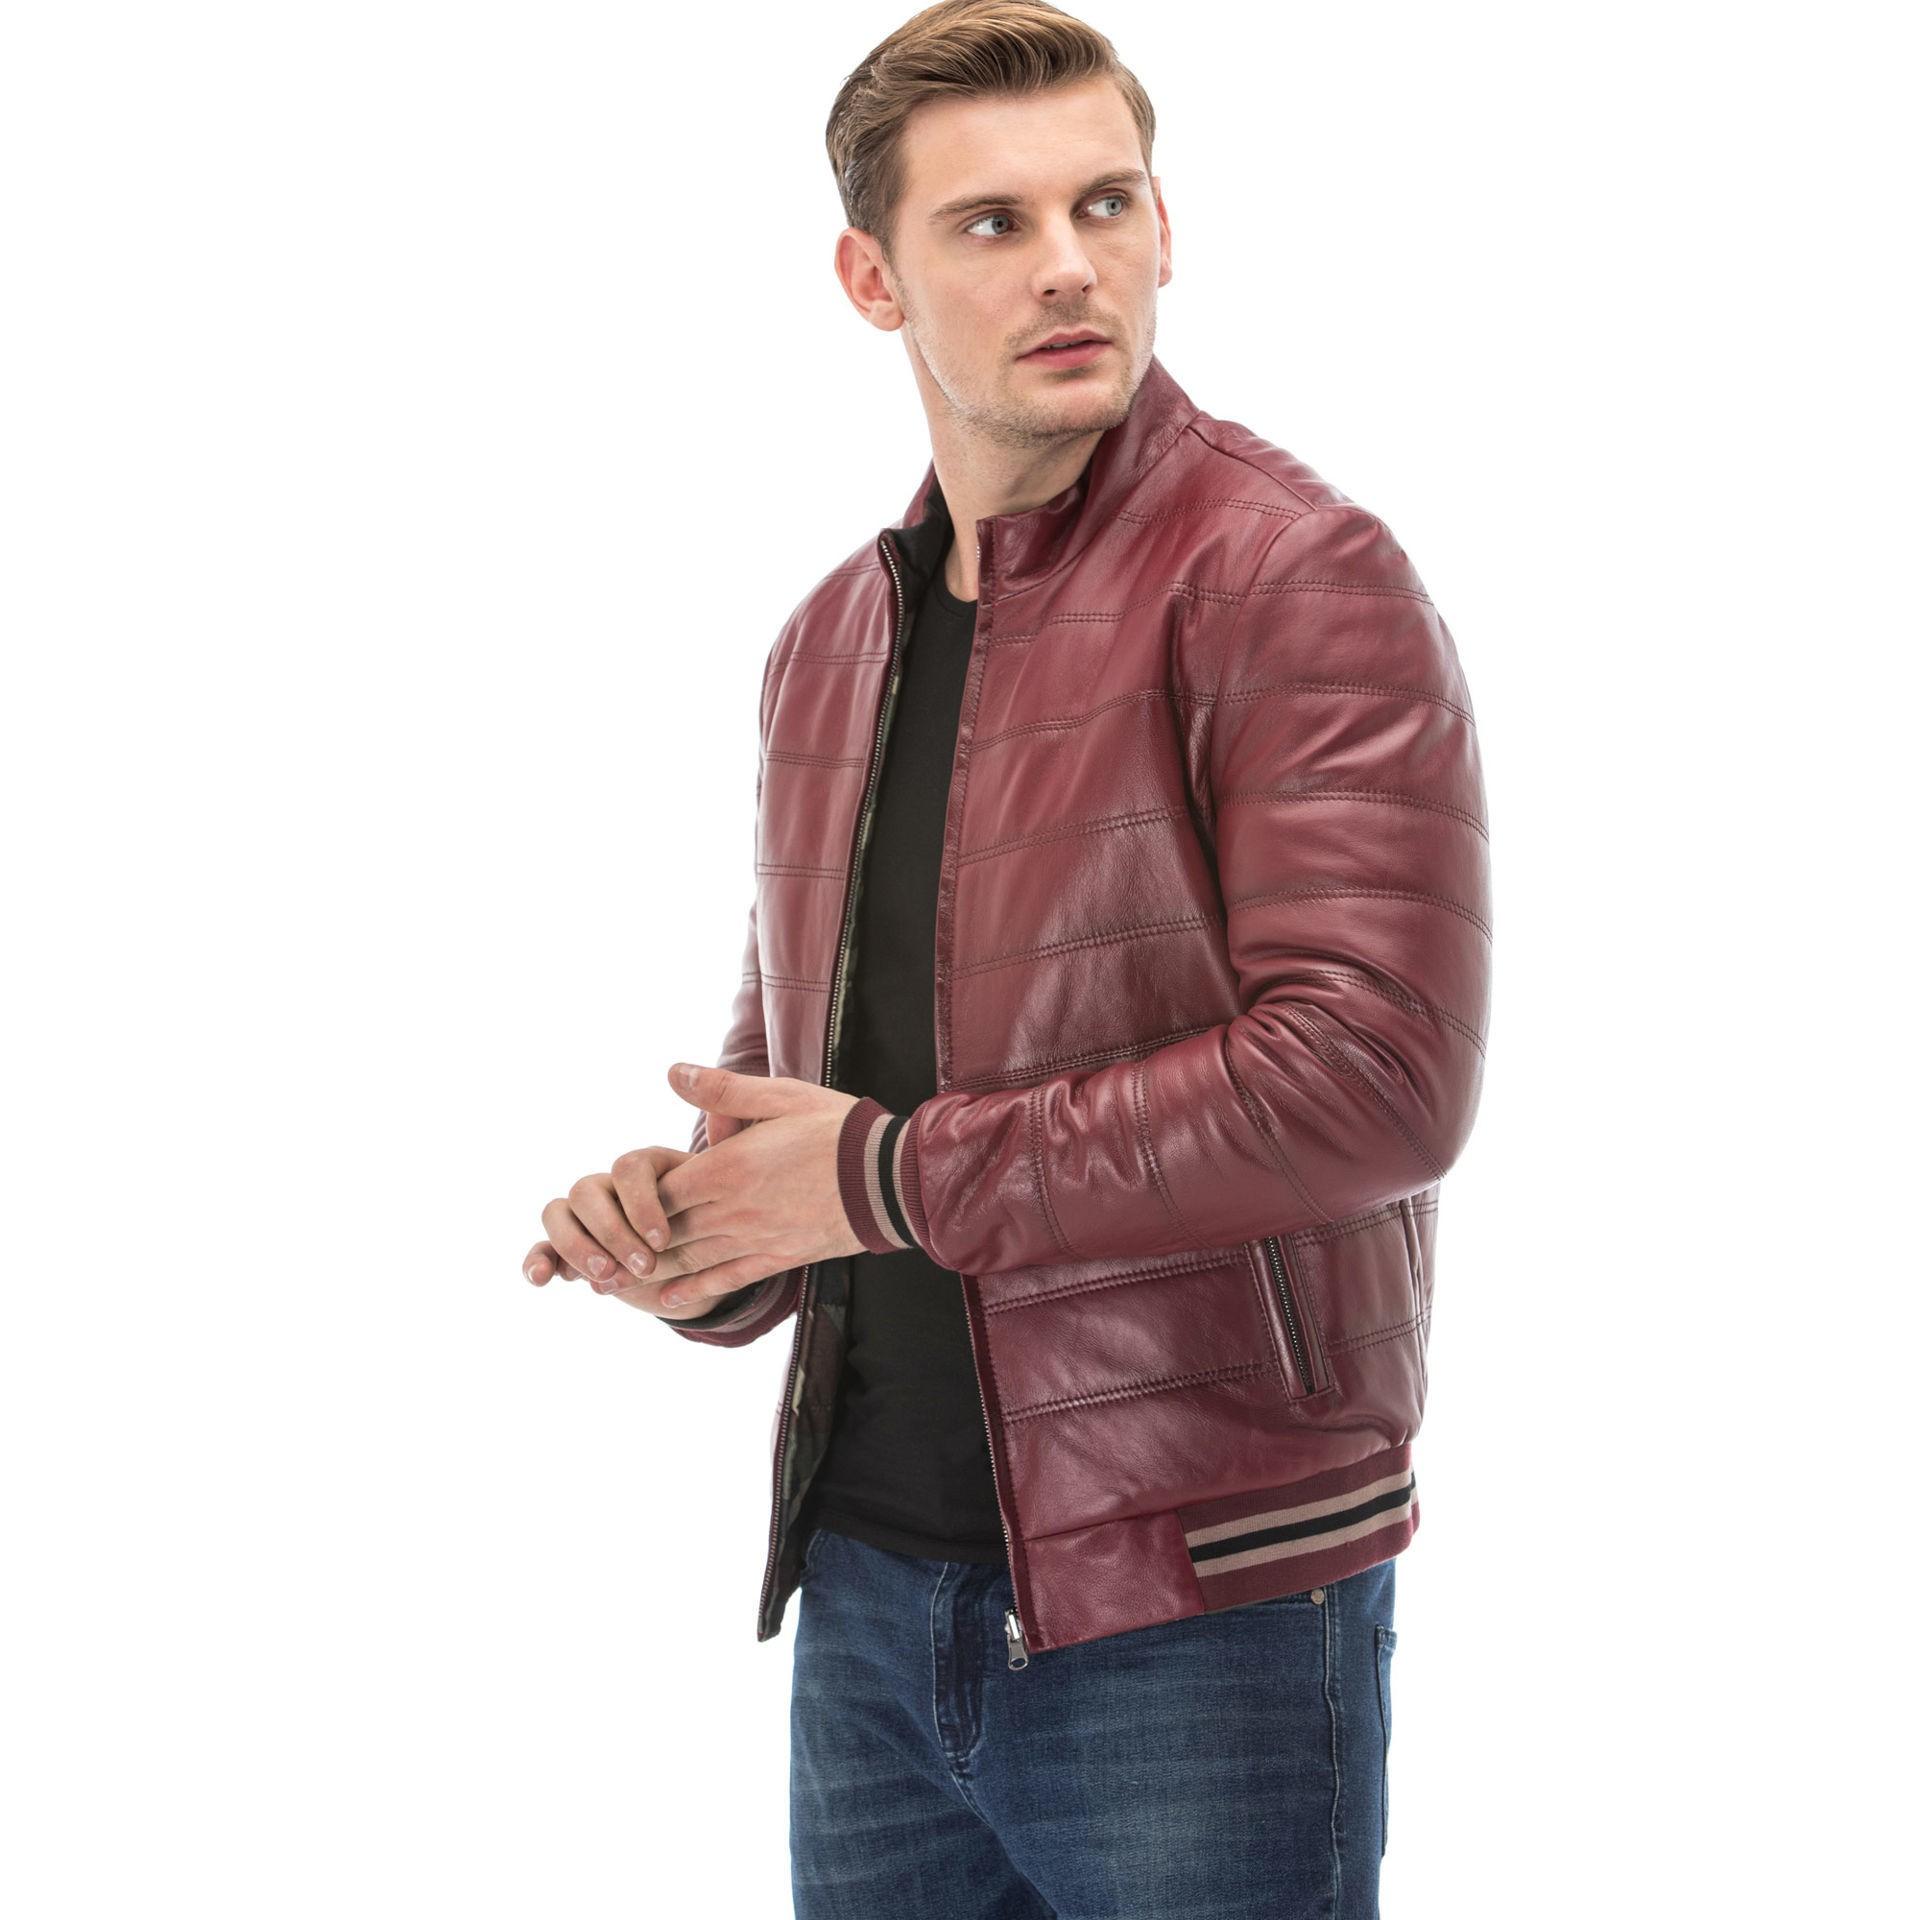 Men's Burgundy Double-Sided Leather Jacket